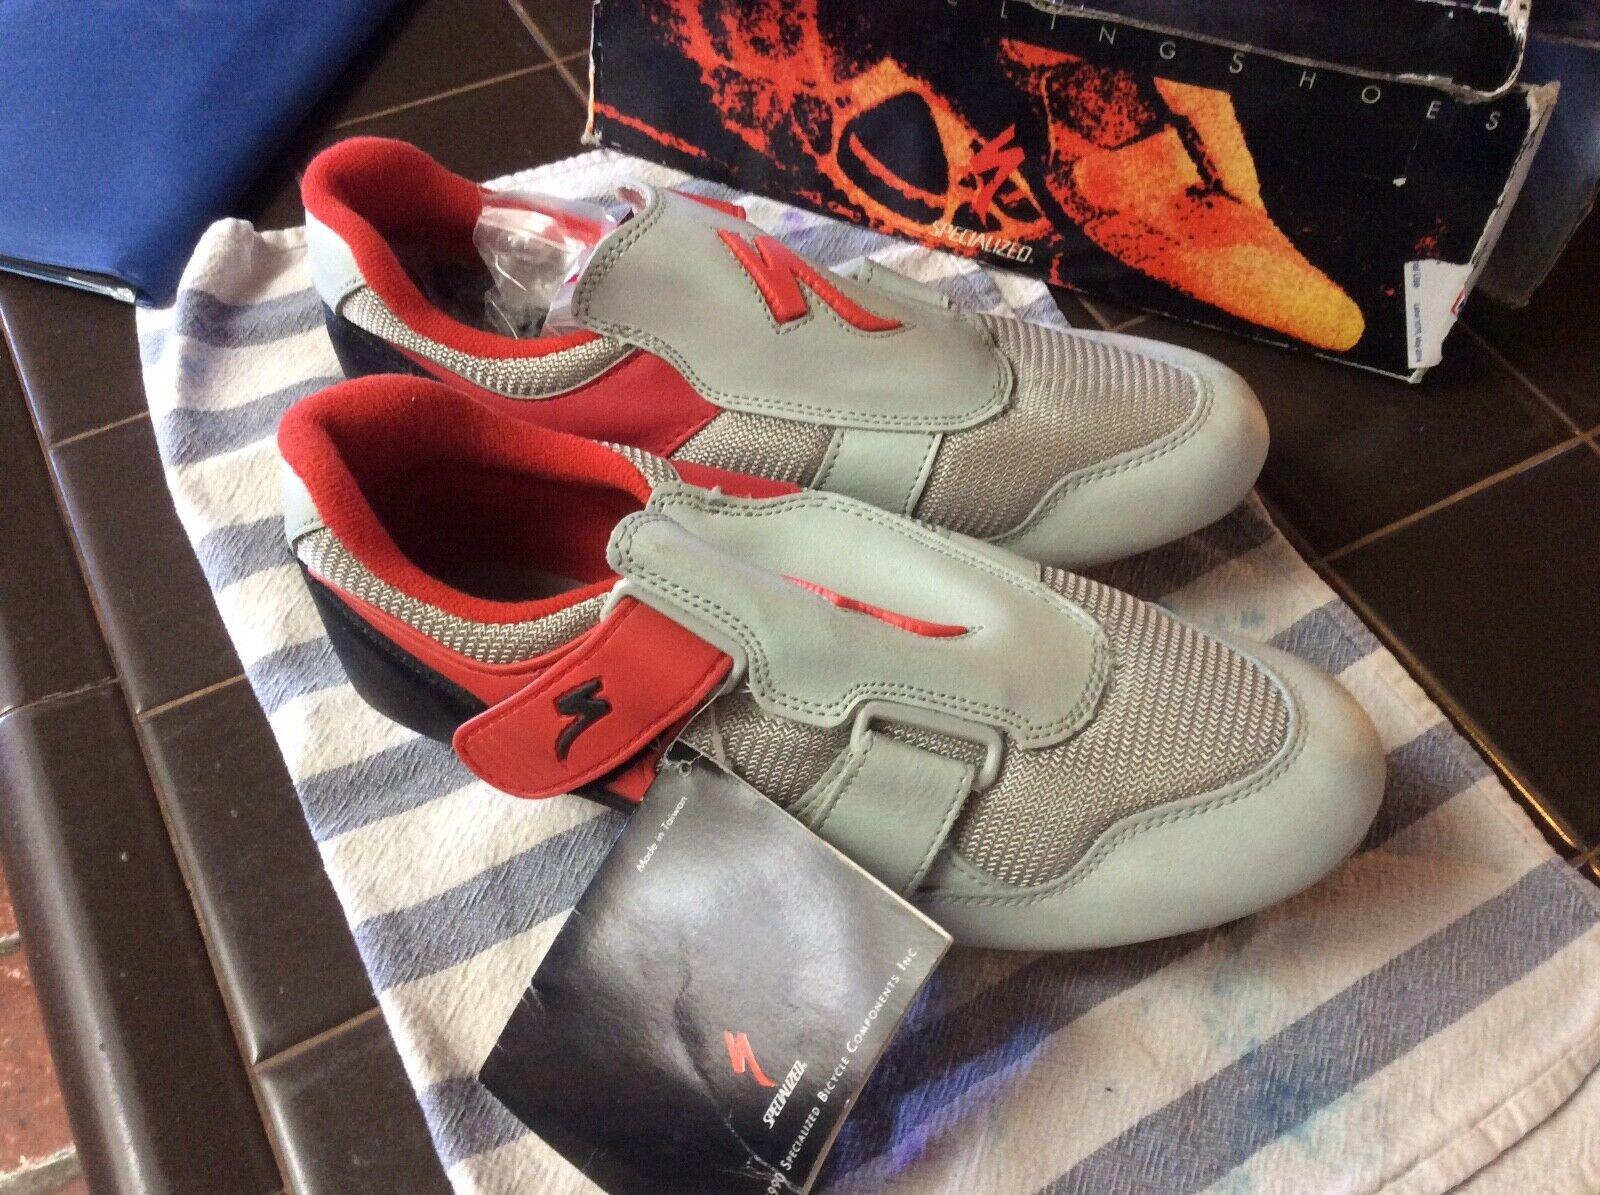 specialeeized Pro strada ciclismo sautope , Diuominiione 41 NIB